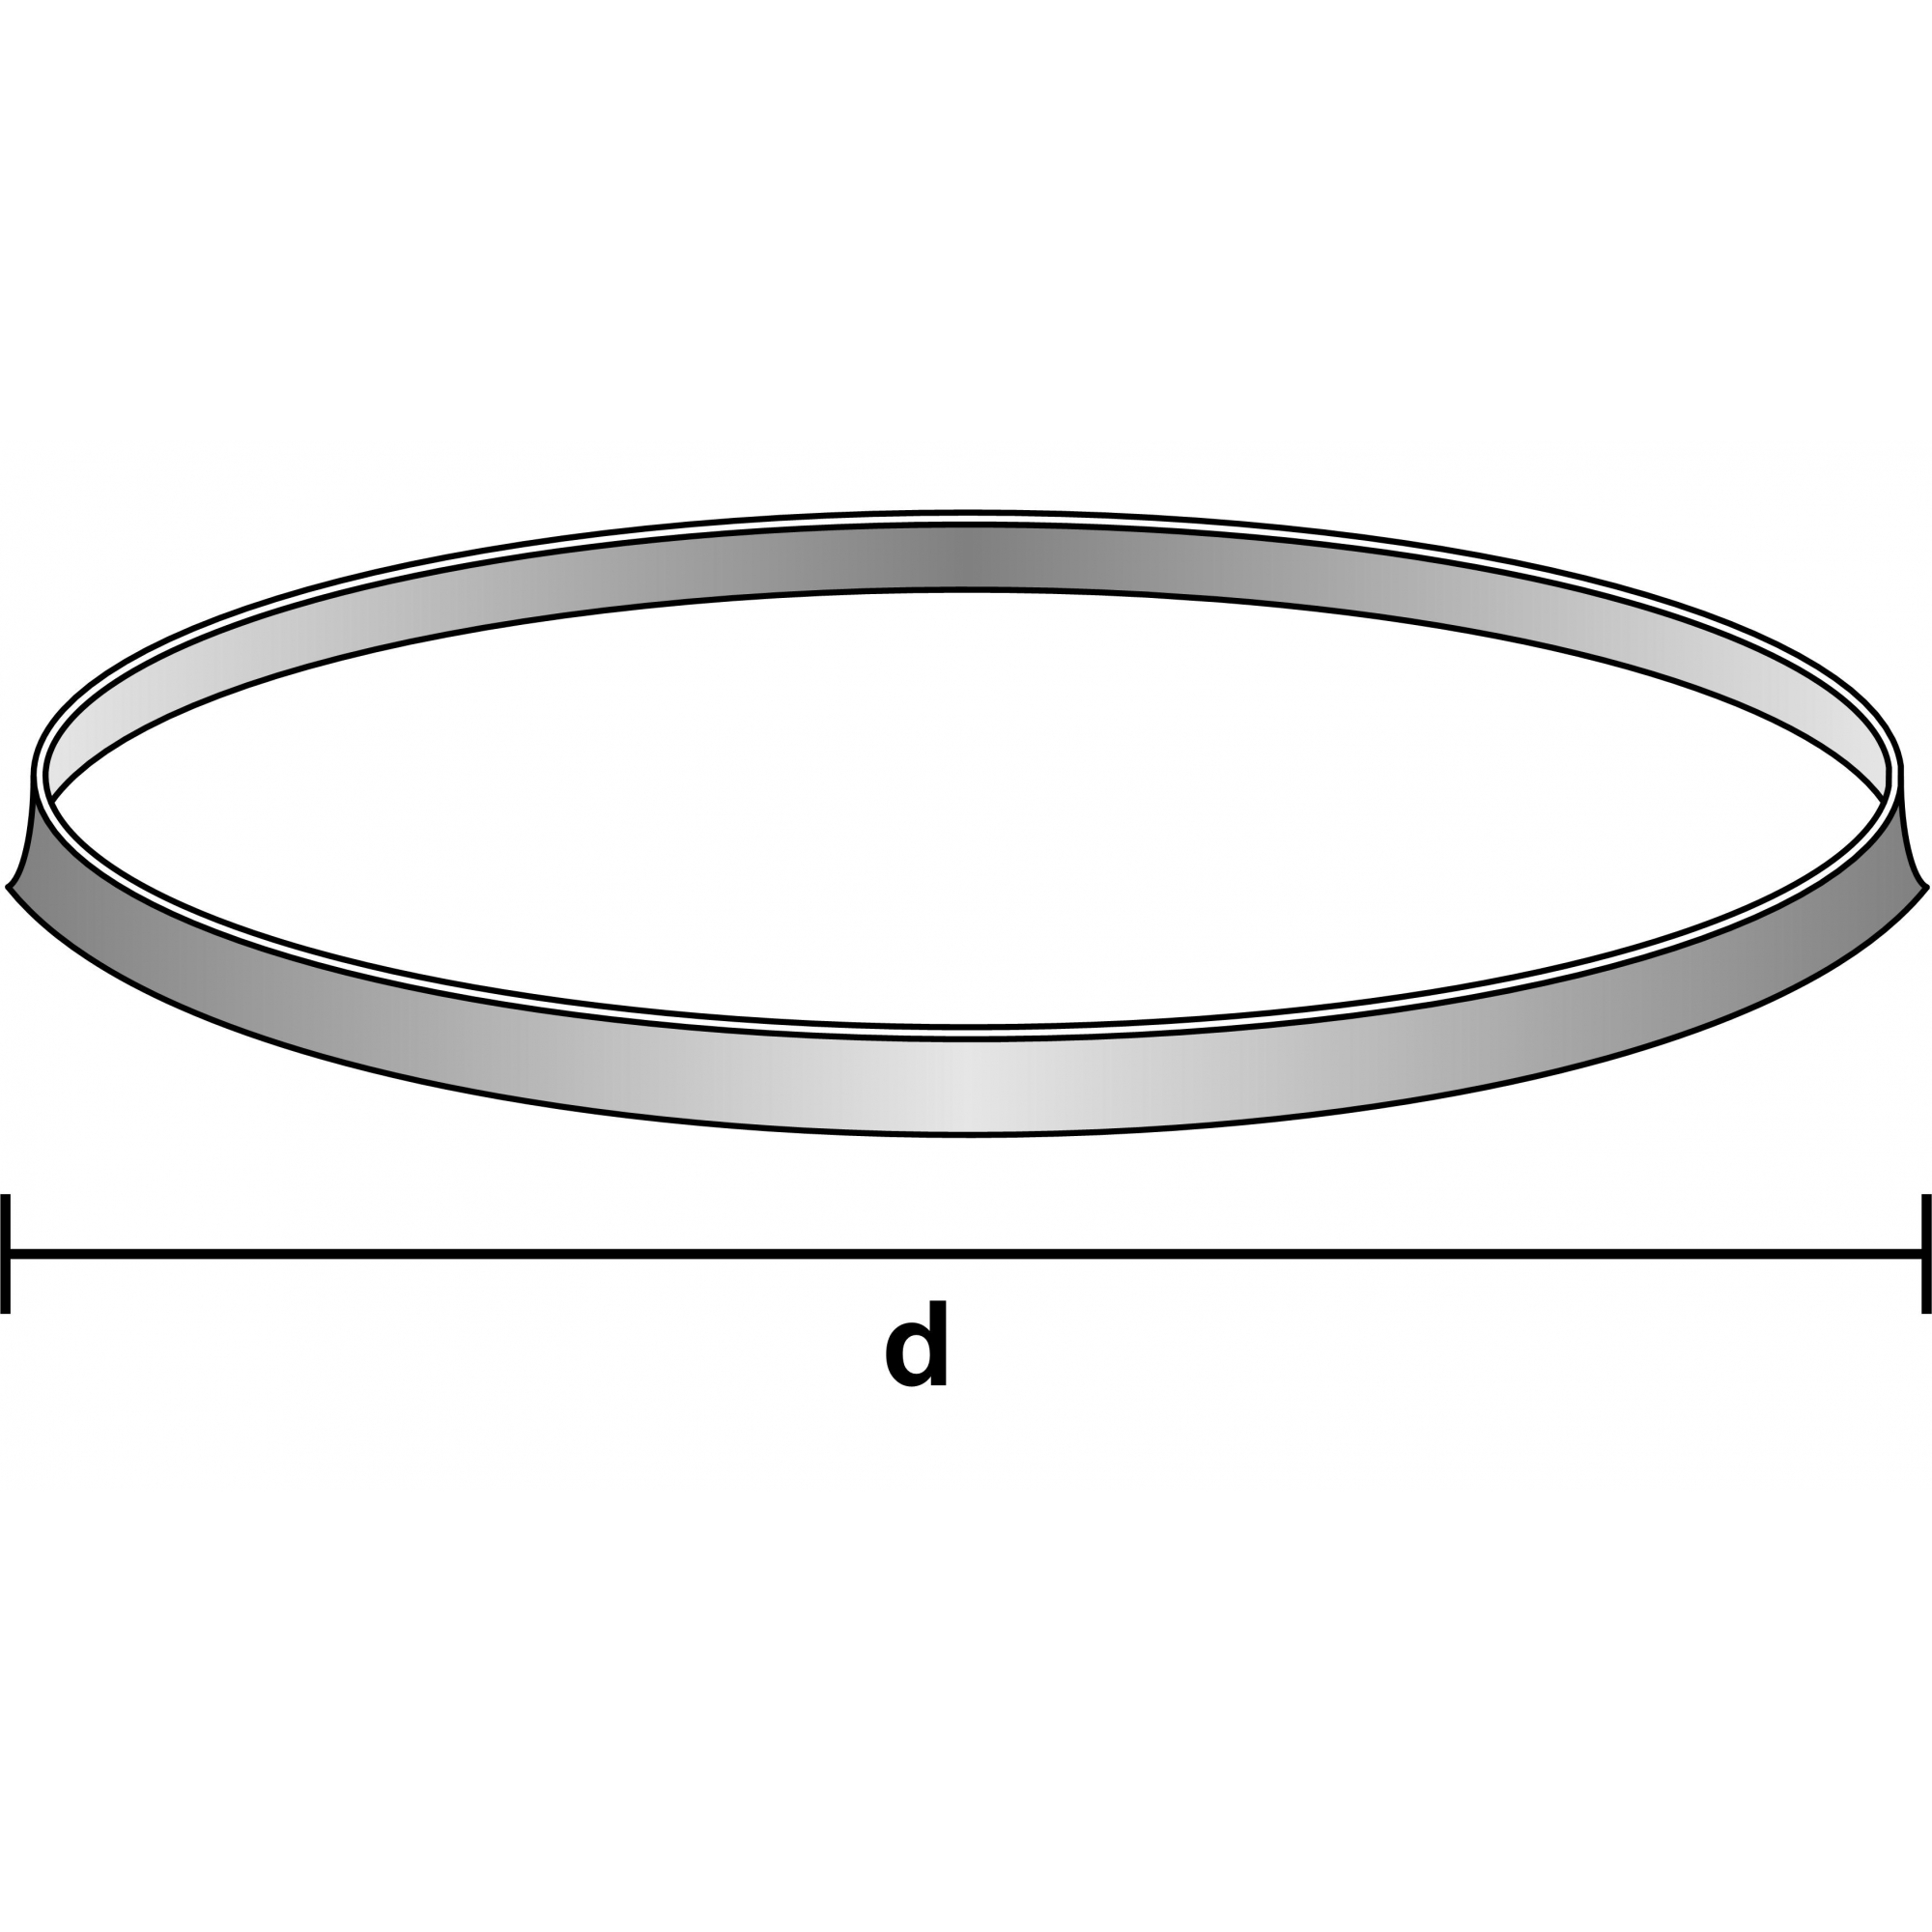 ANEL ORING EM POLIPROPILENO LILAS GL 45 - Laborglas - Cód. 9924928